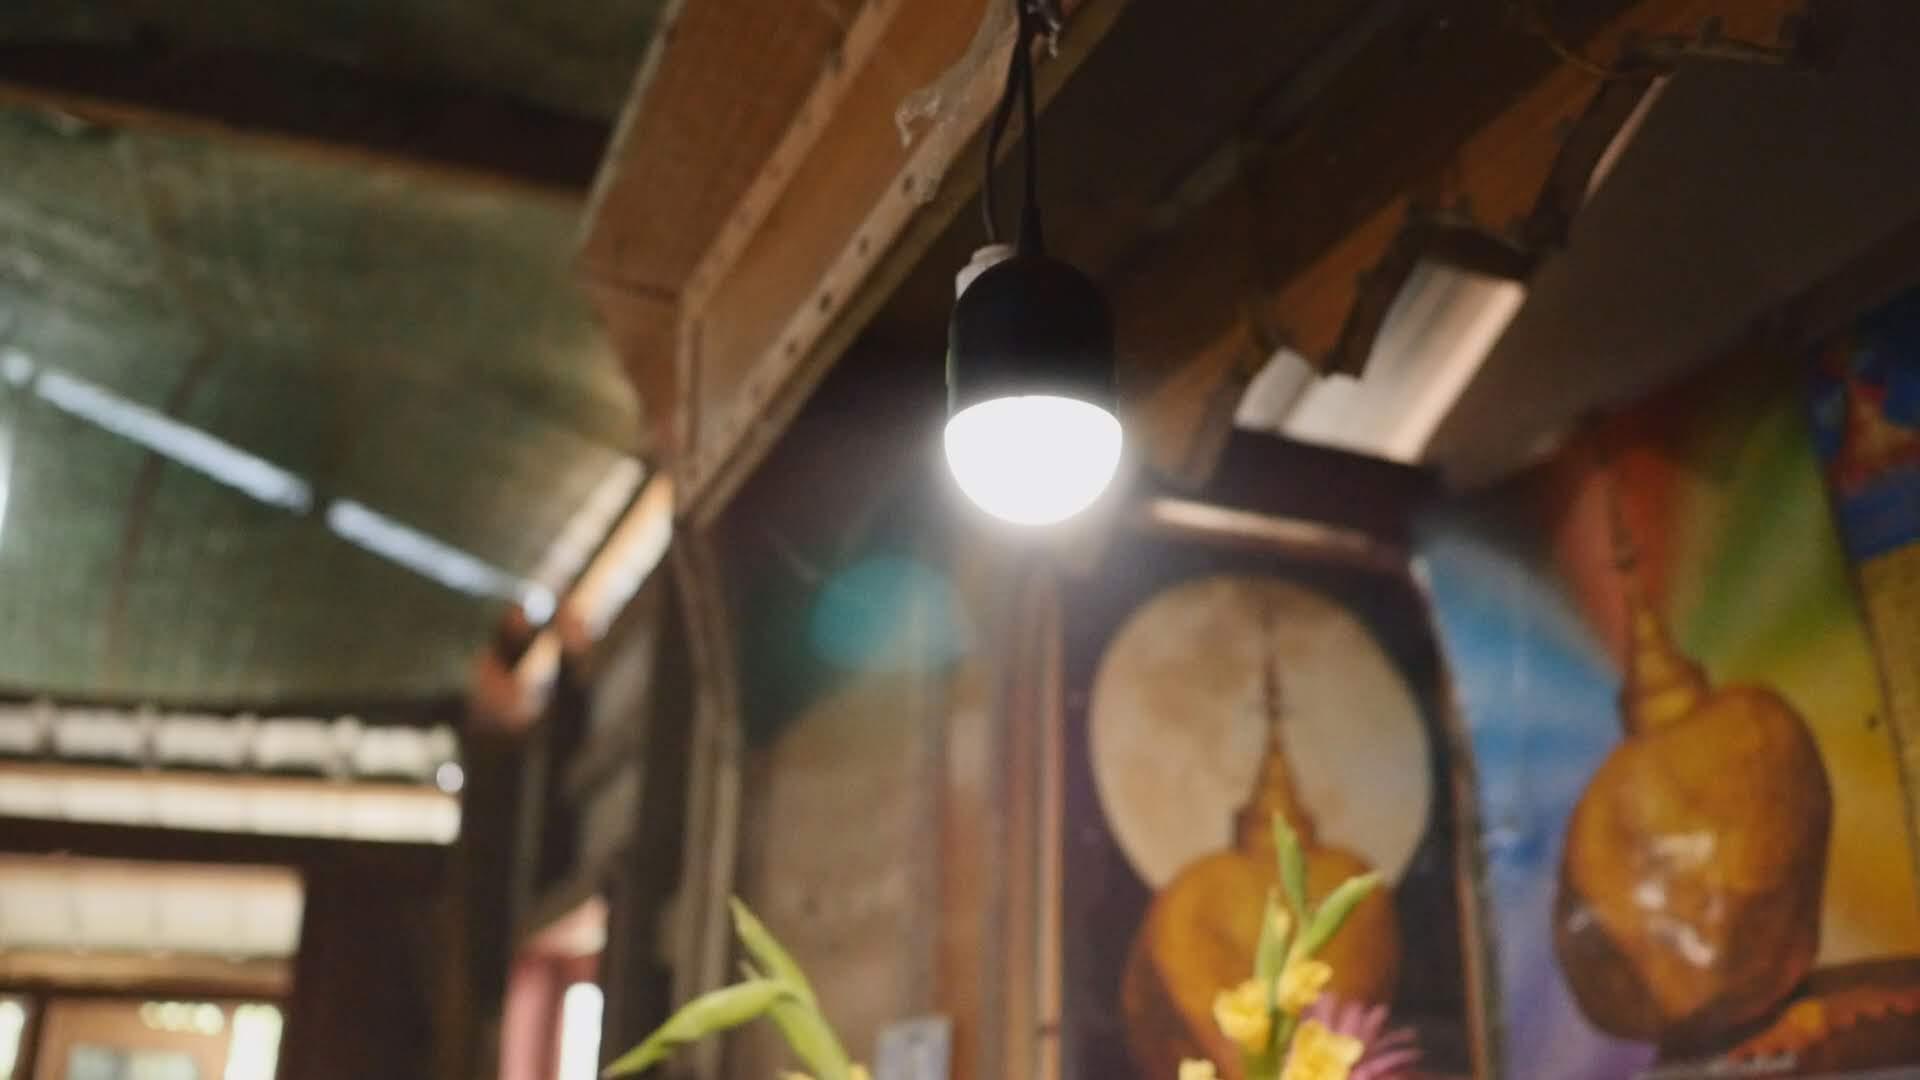 Photo: the lighting provided by Panasonic